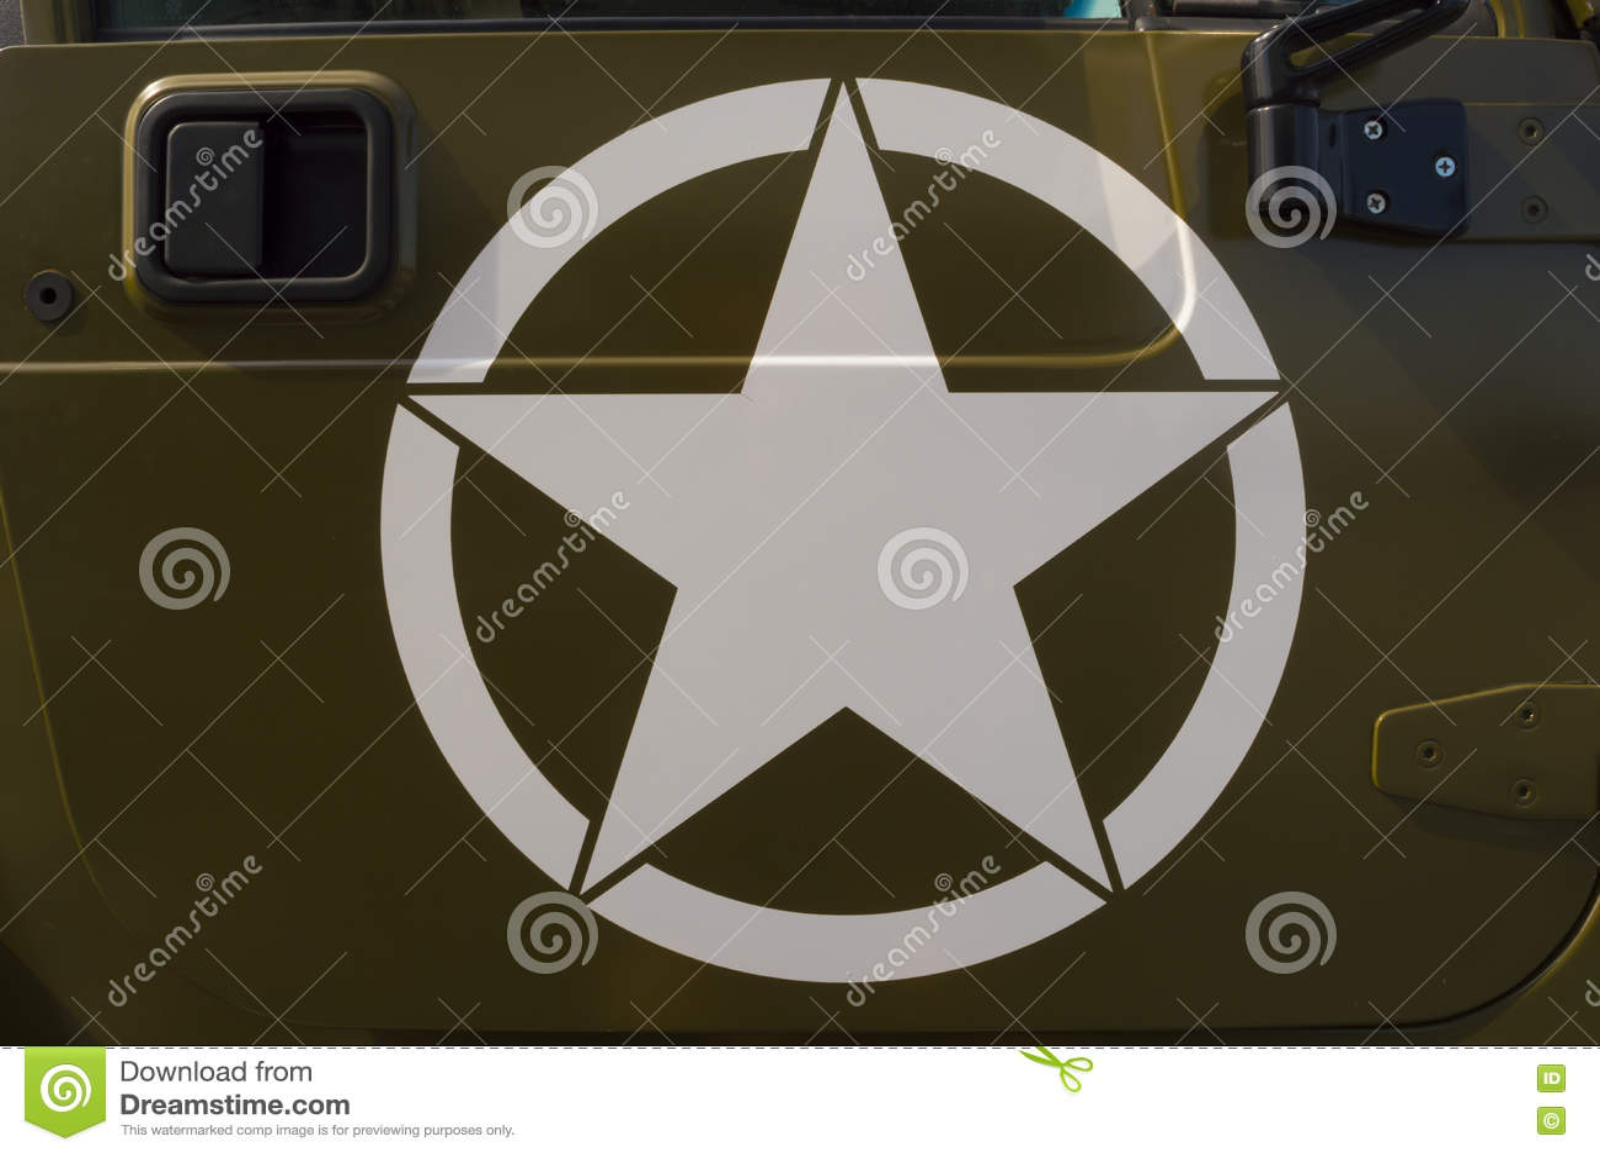 US Army Symbol stock photo  Image of military, vehicle